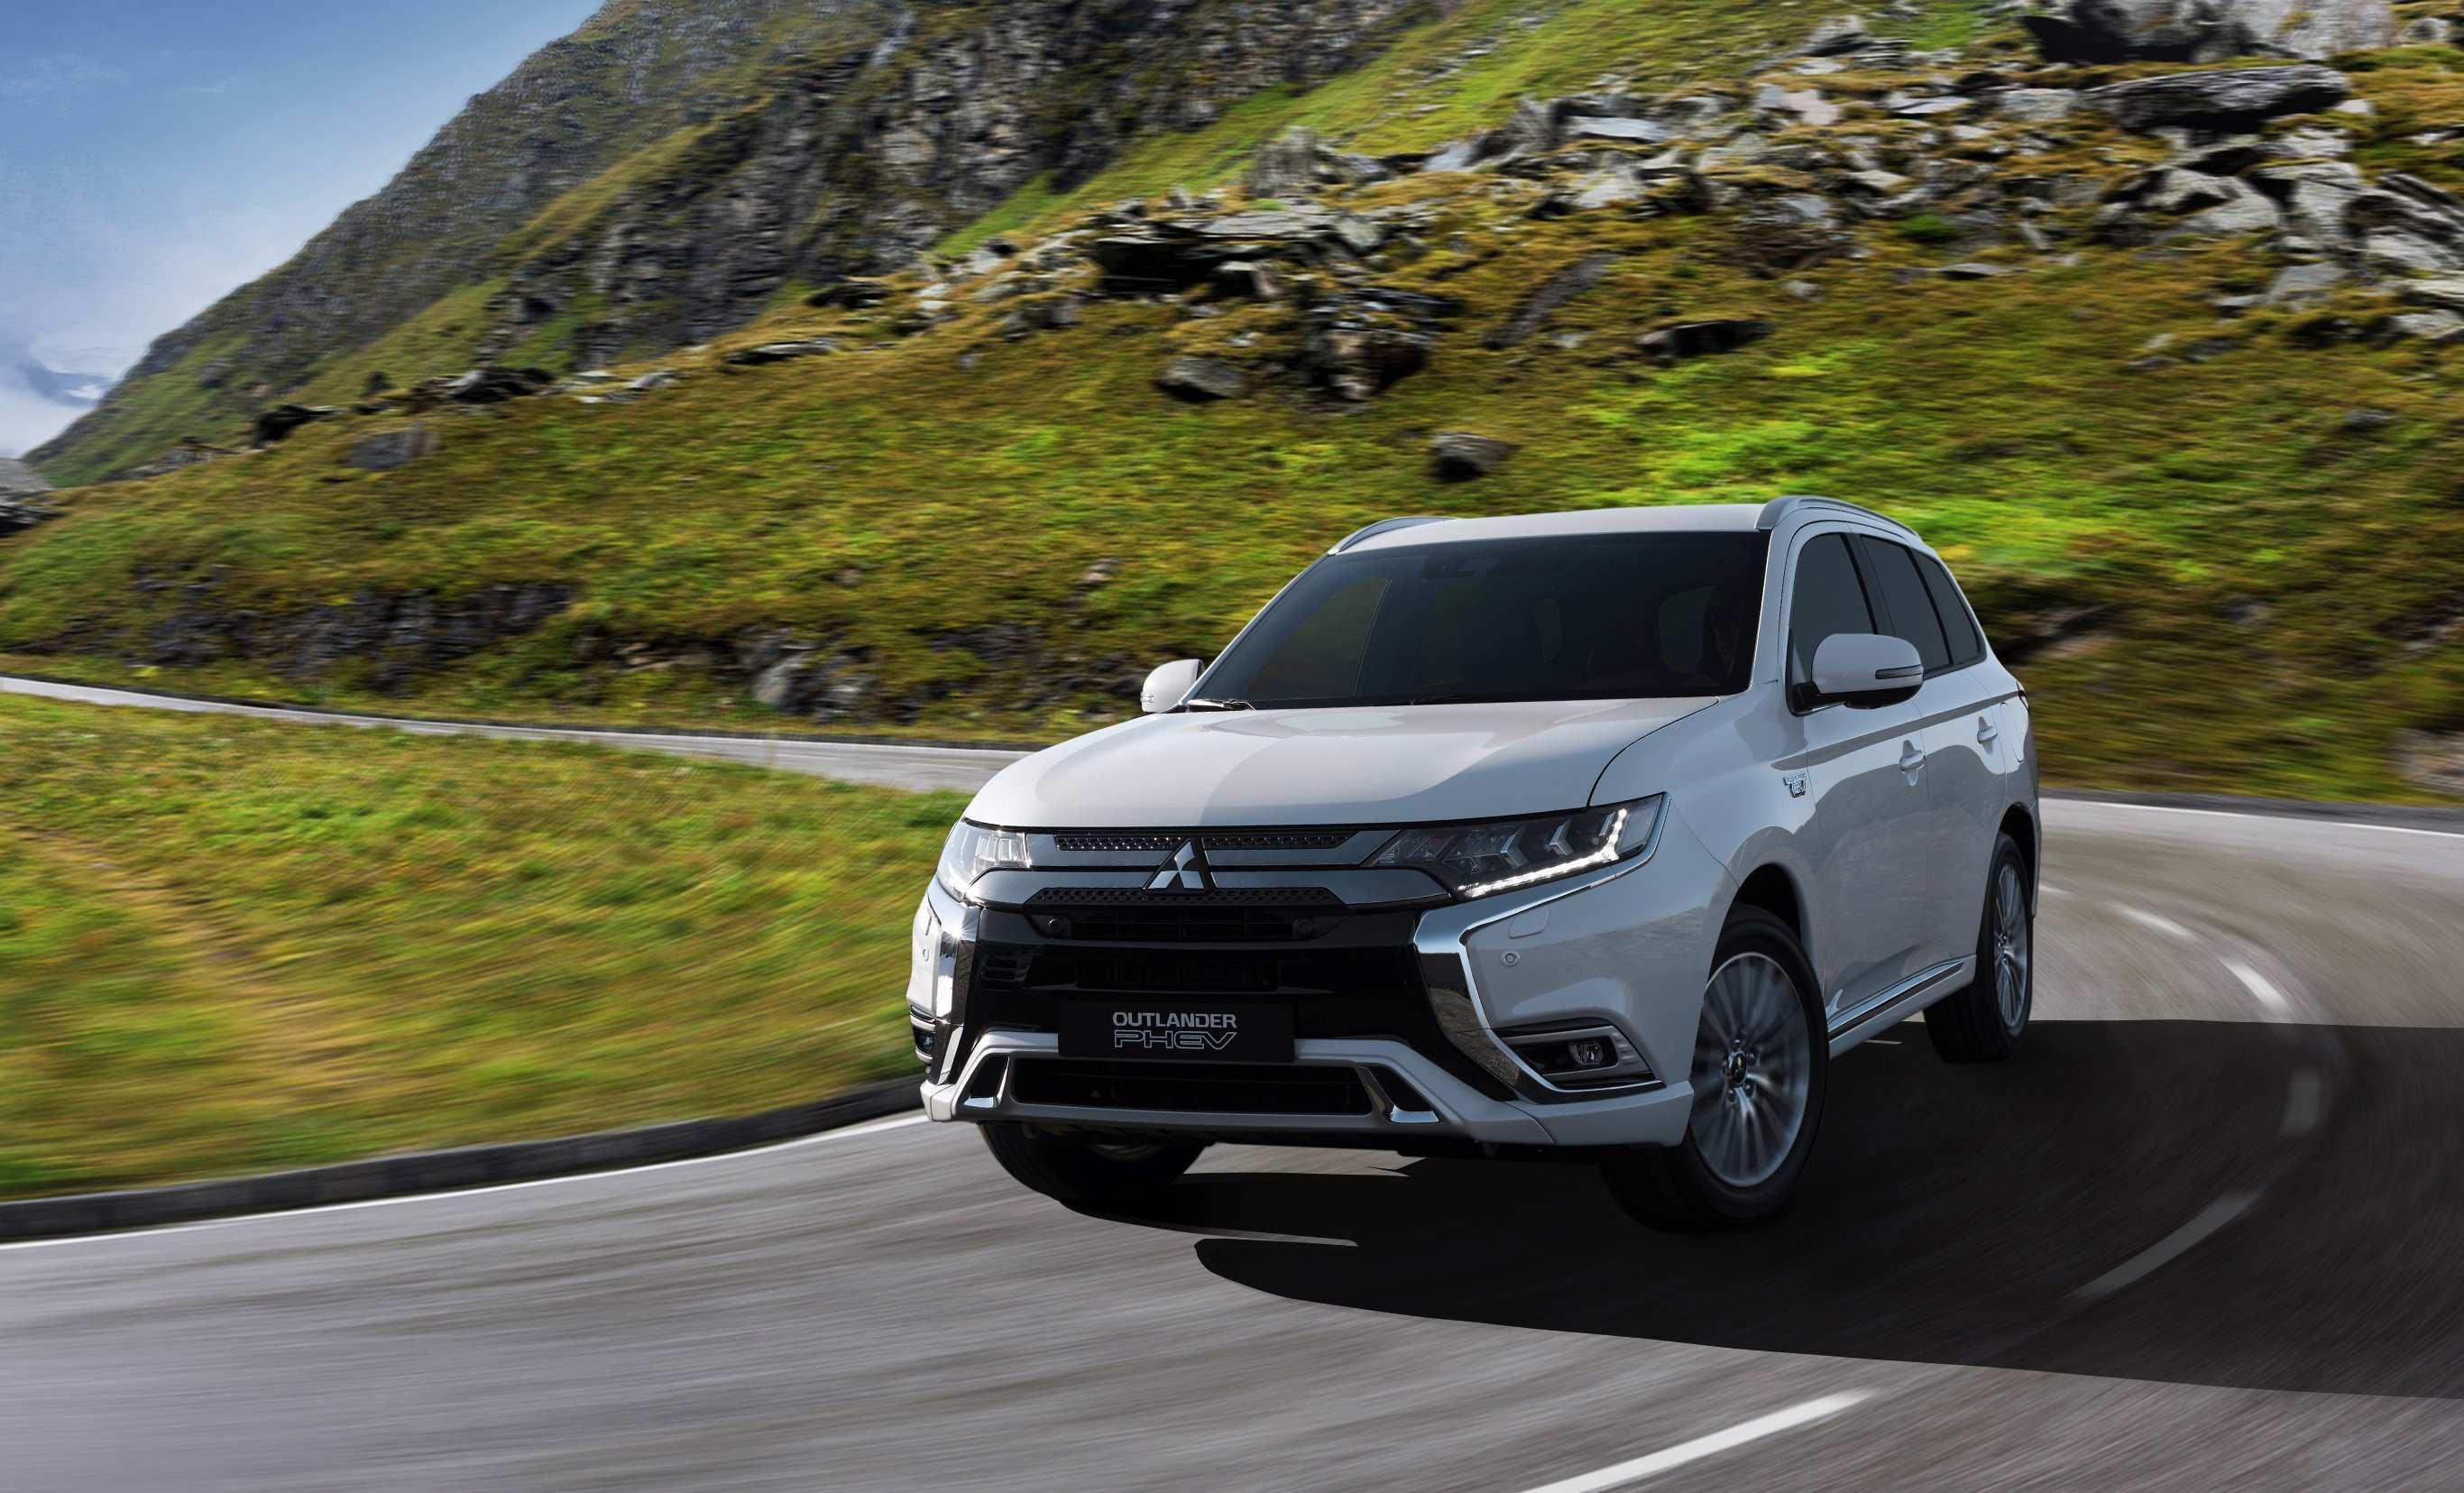 17 Best Review Uusi Mitsubishi Asx 2020 Photos with Uusi Mitsubishi Asx 2020